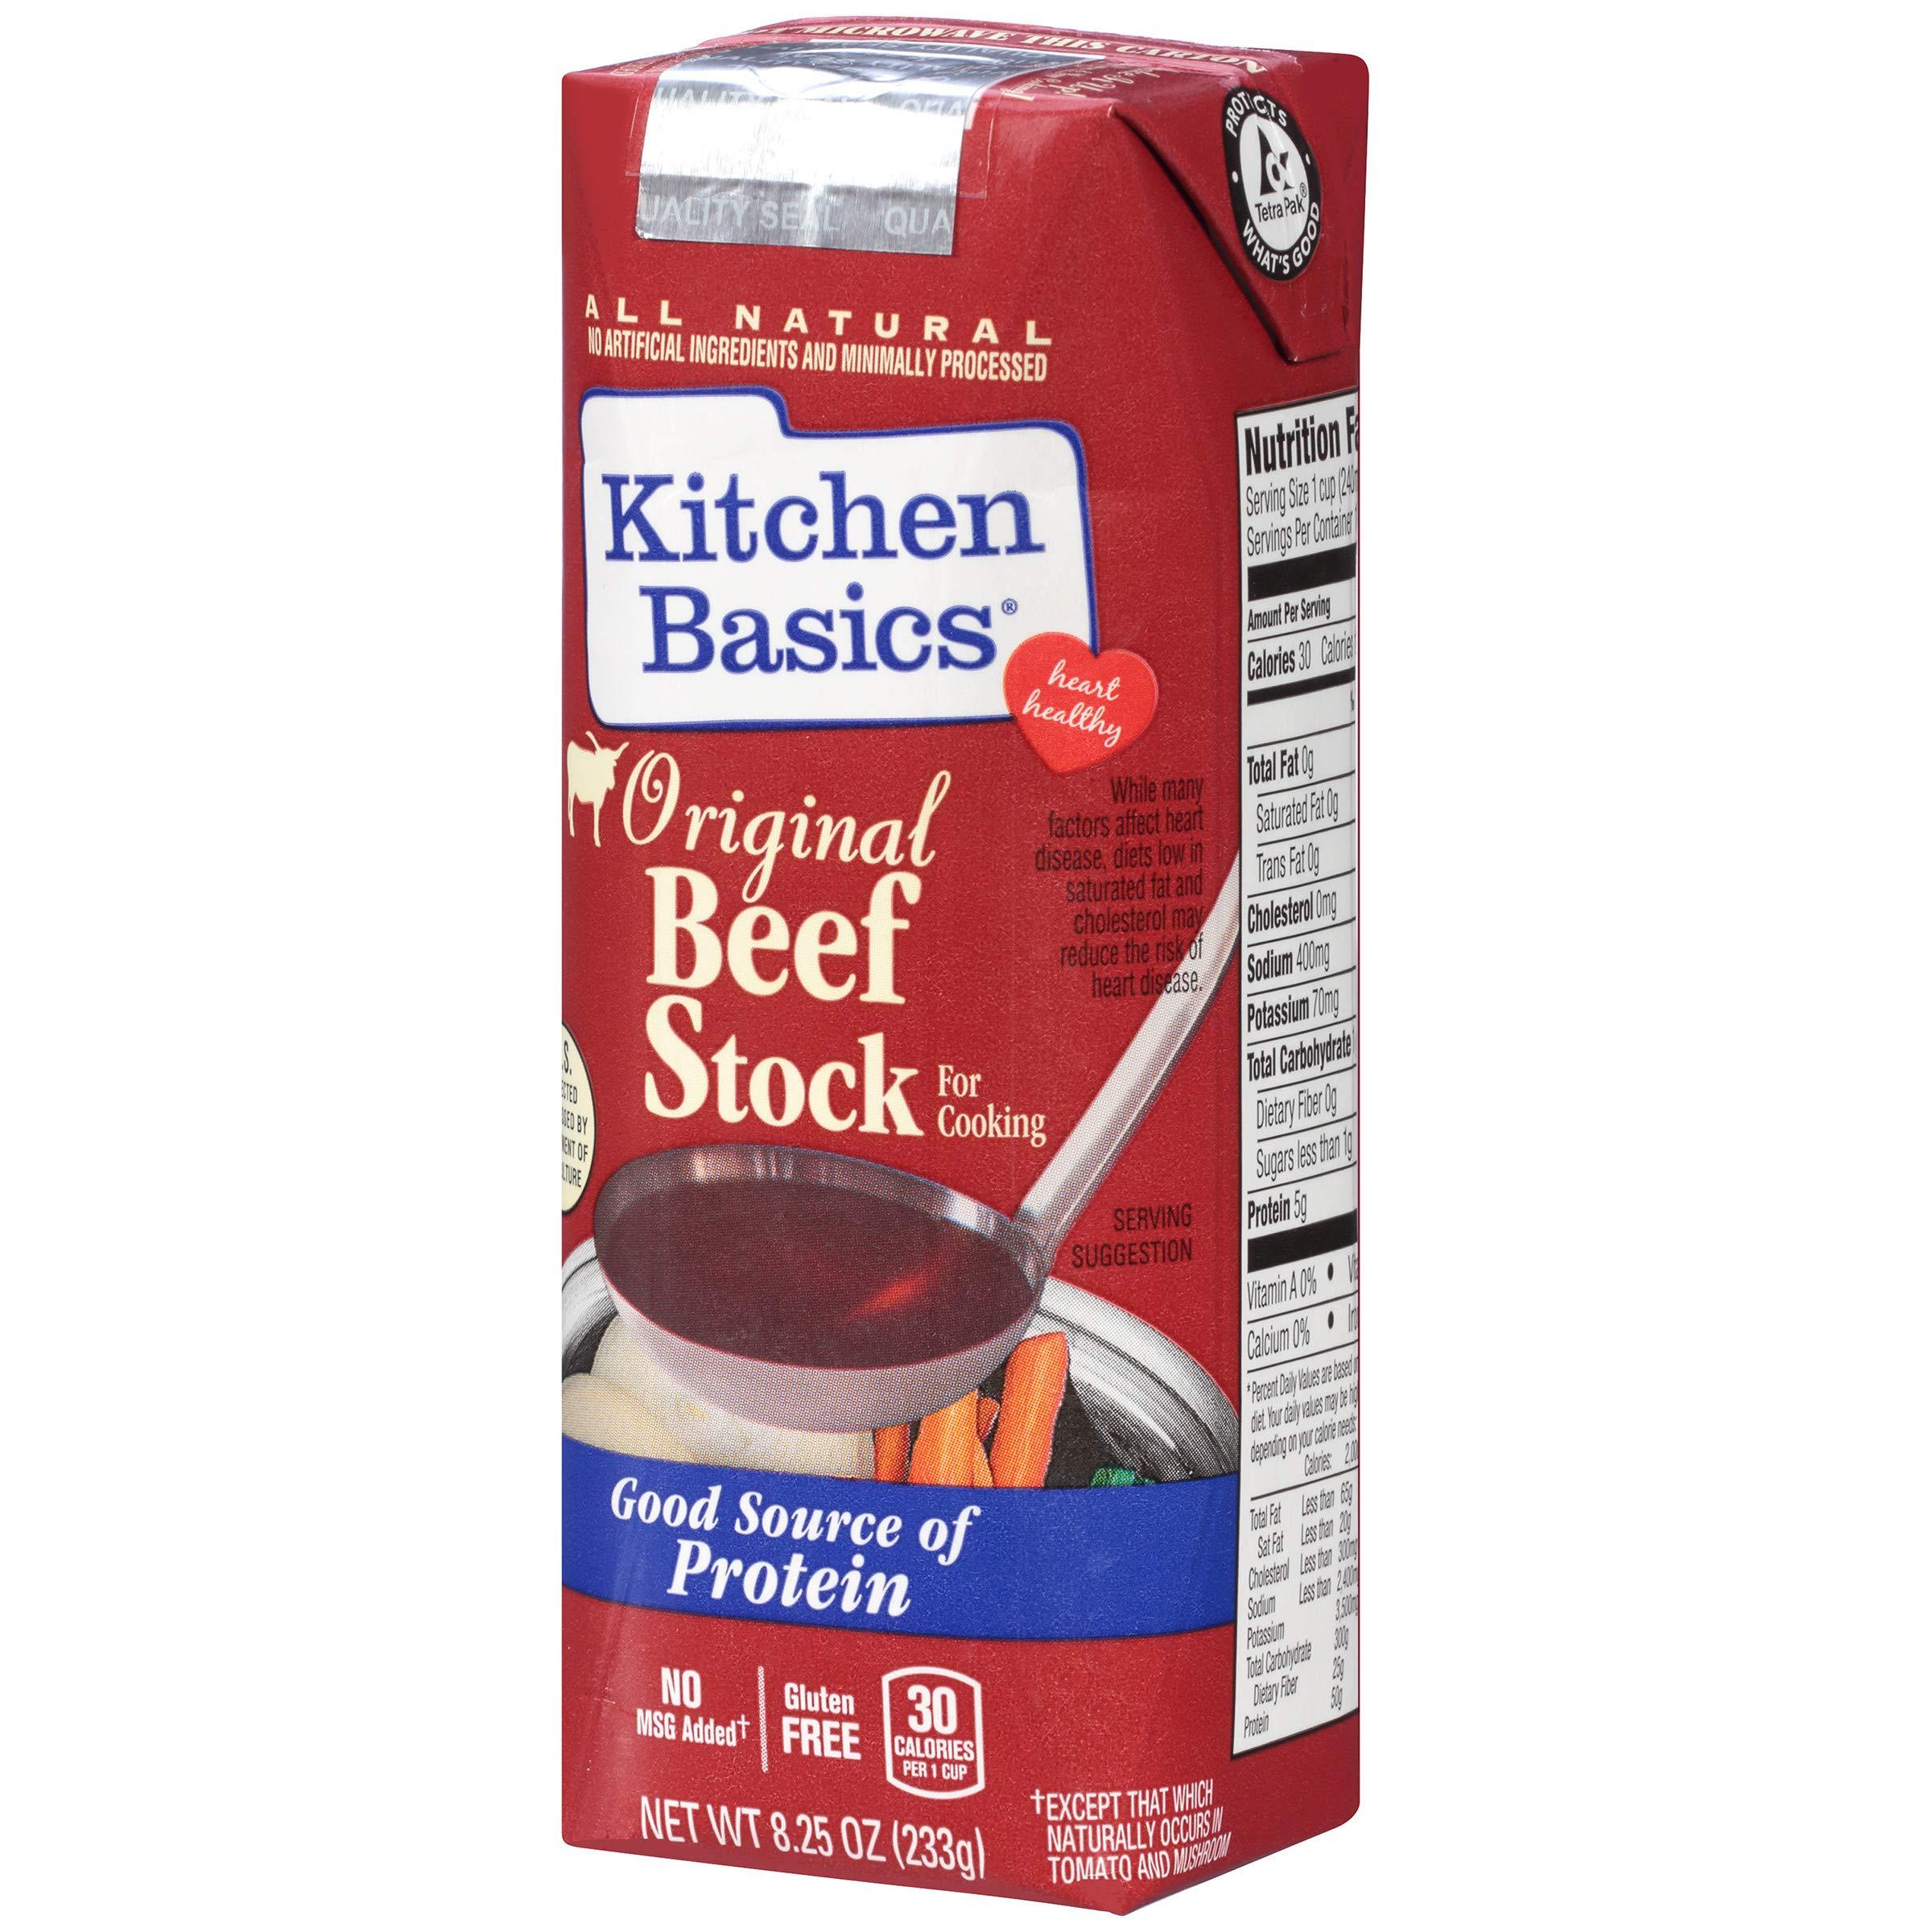 Kitchen Basics All Natural Original Beef Stock, 8.25 fl oz